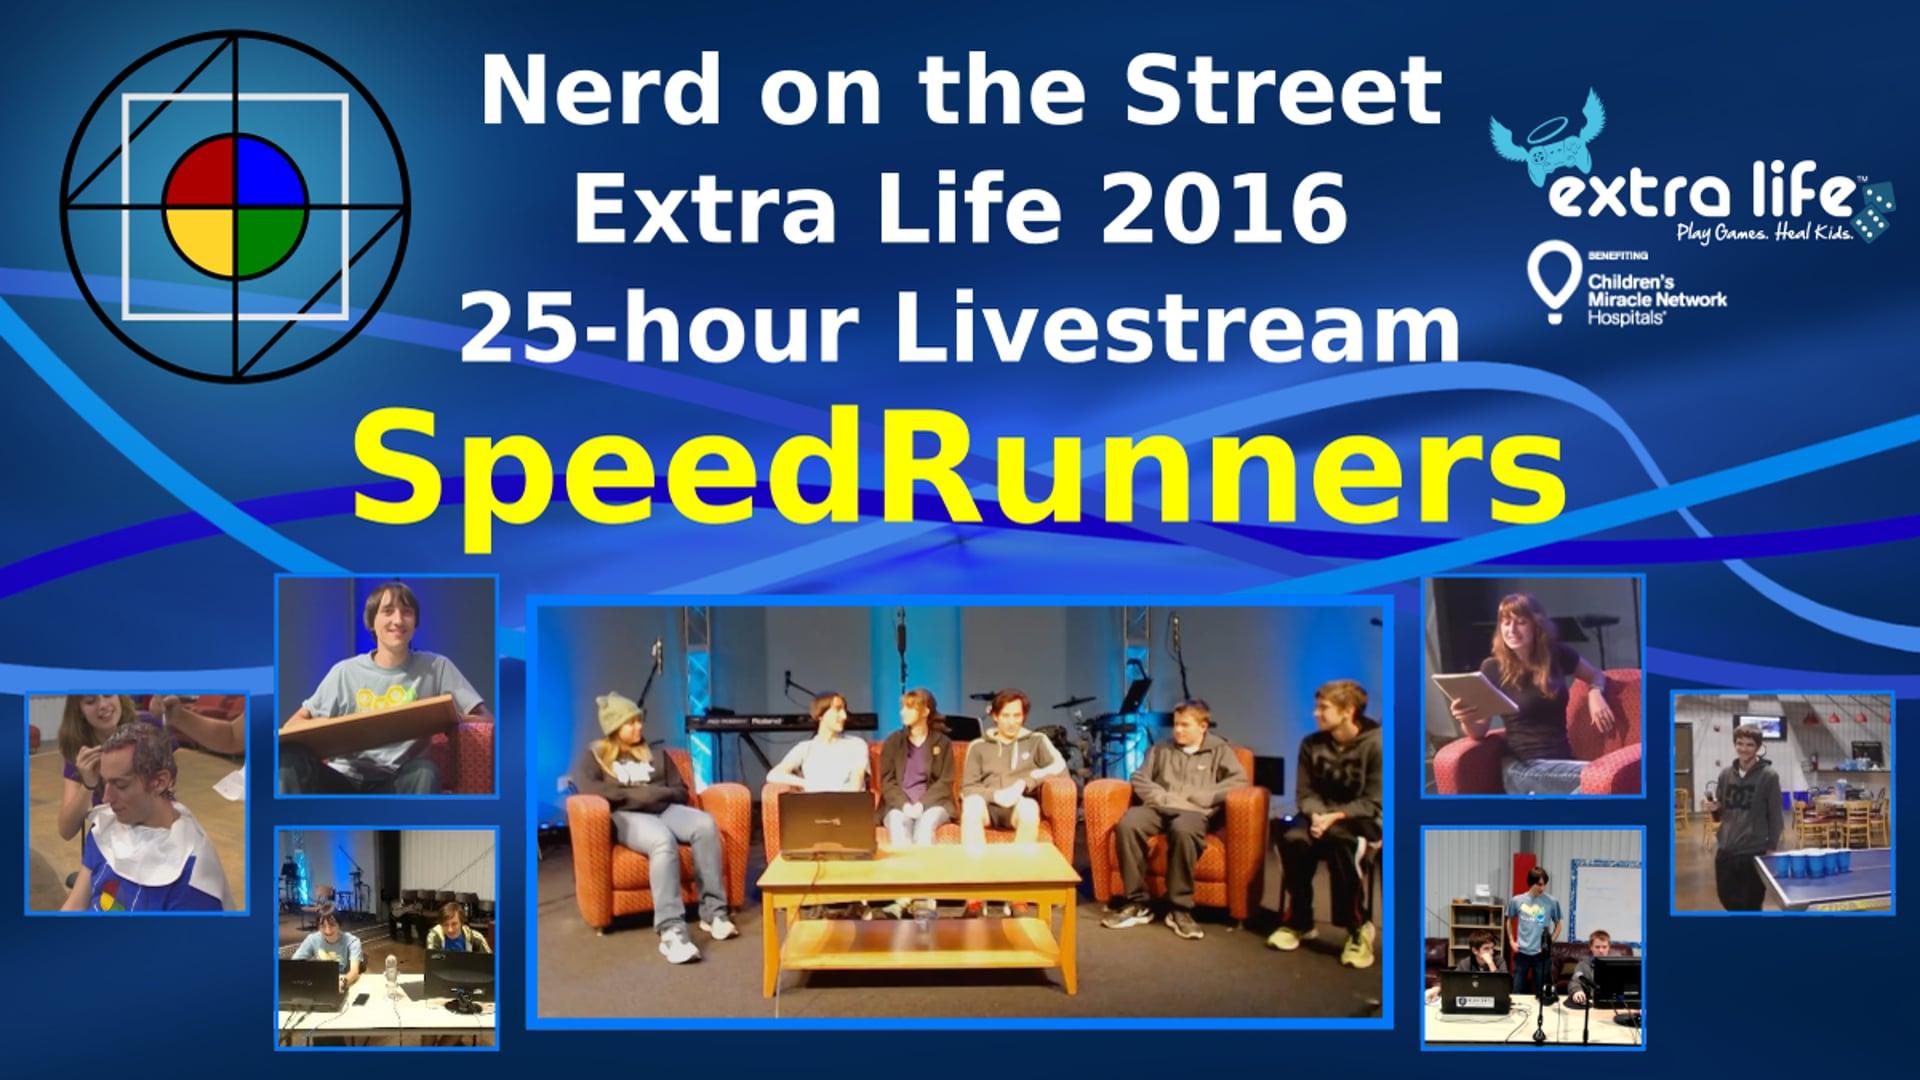 SpeedRunners - Extra Life 2016